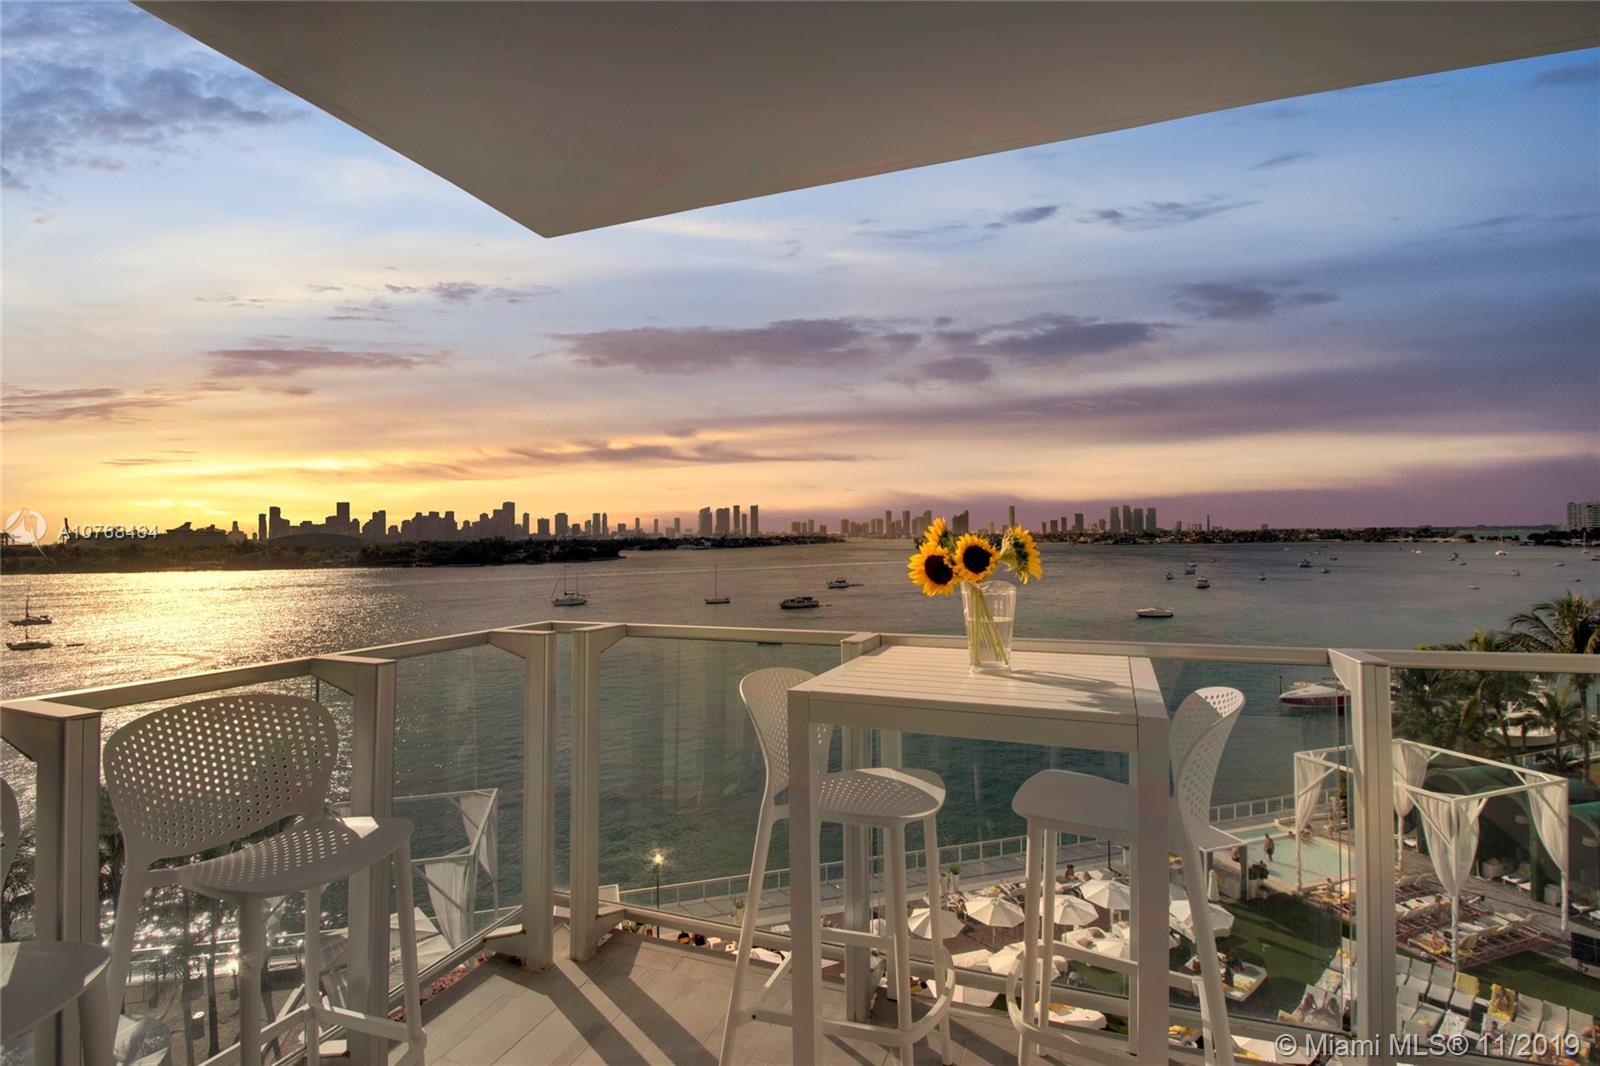 1100 West Ave #720, Miami Beach, FL 33139 - Miami Beach, FL real estate listing